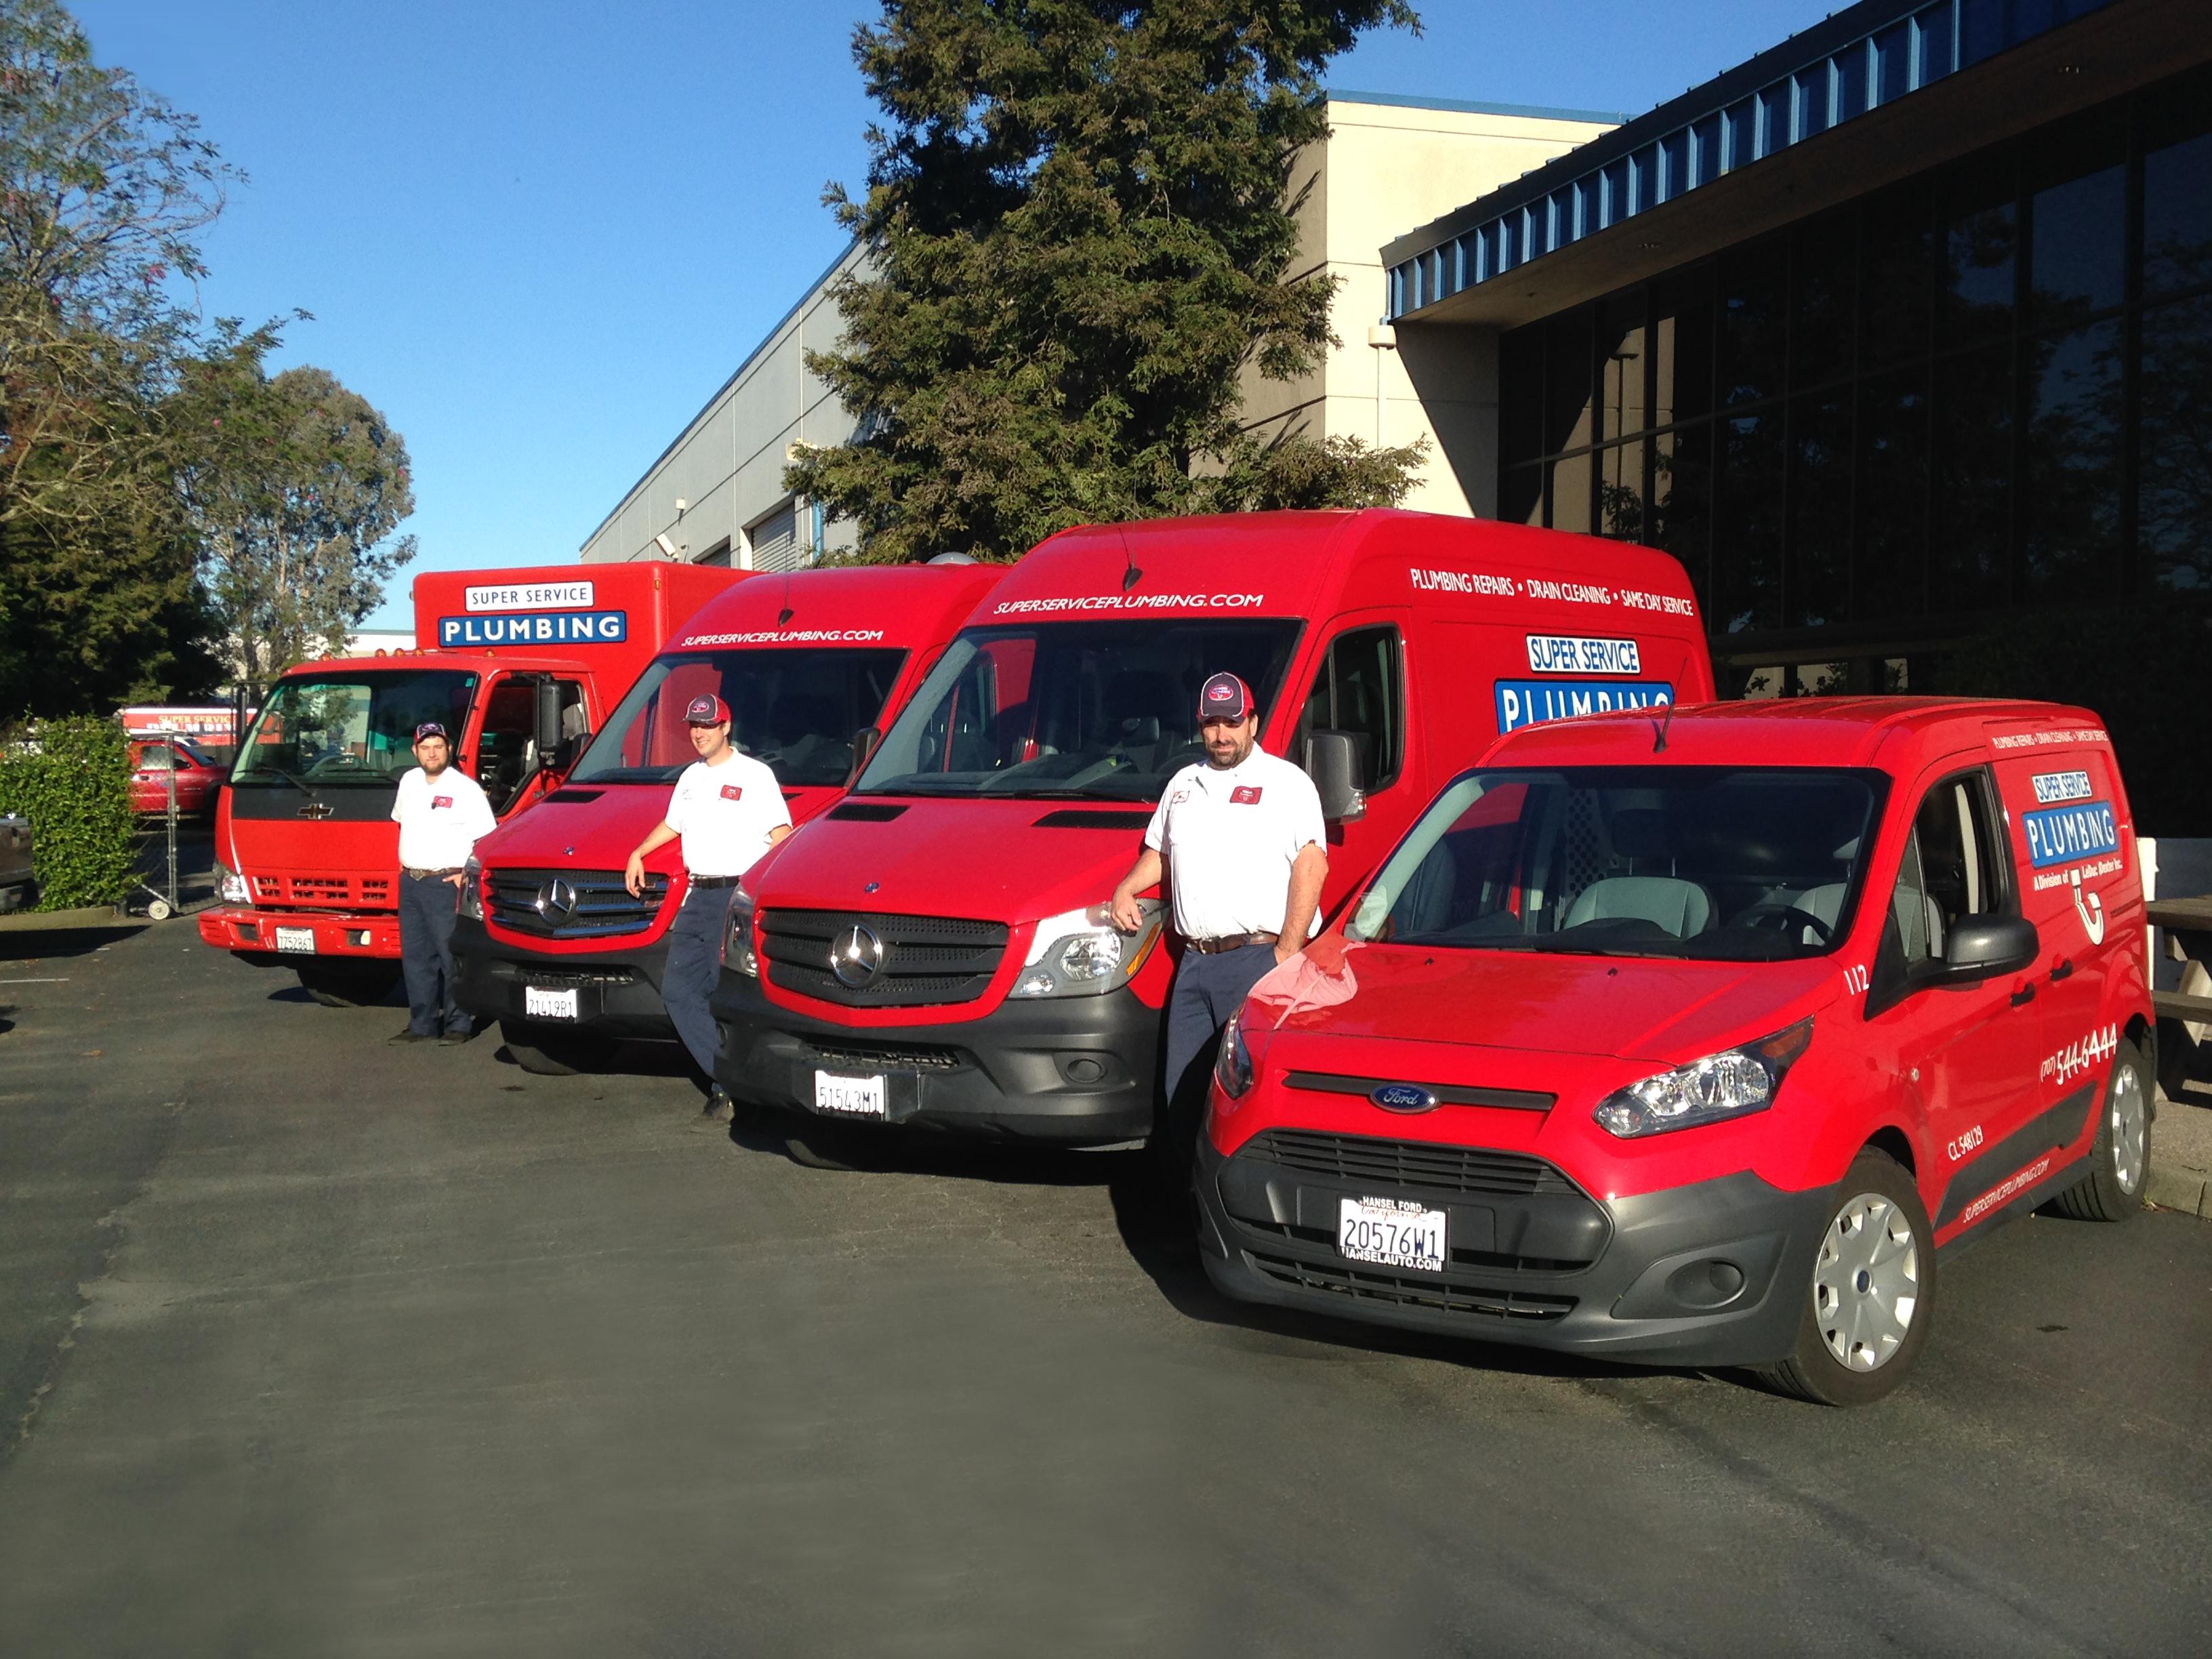 Plumbing Company Trucks